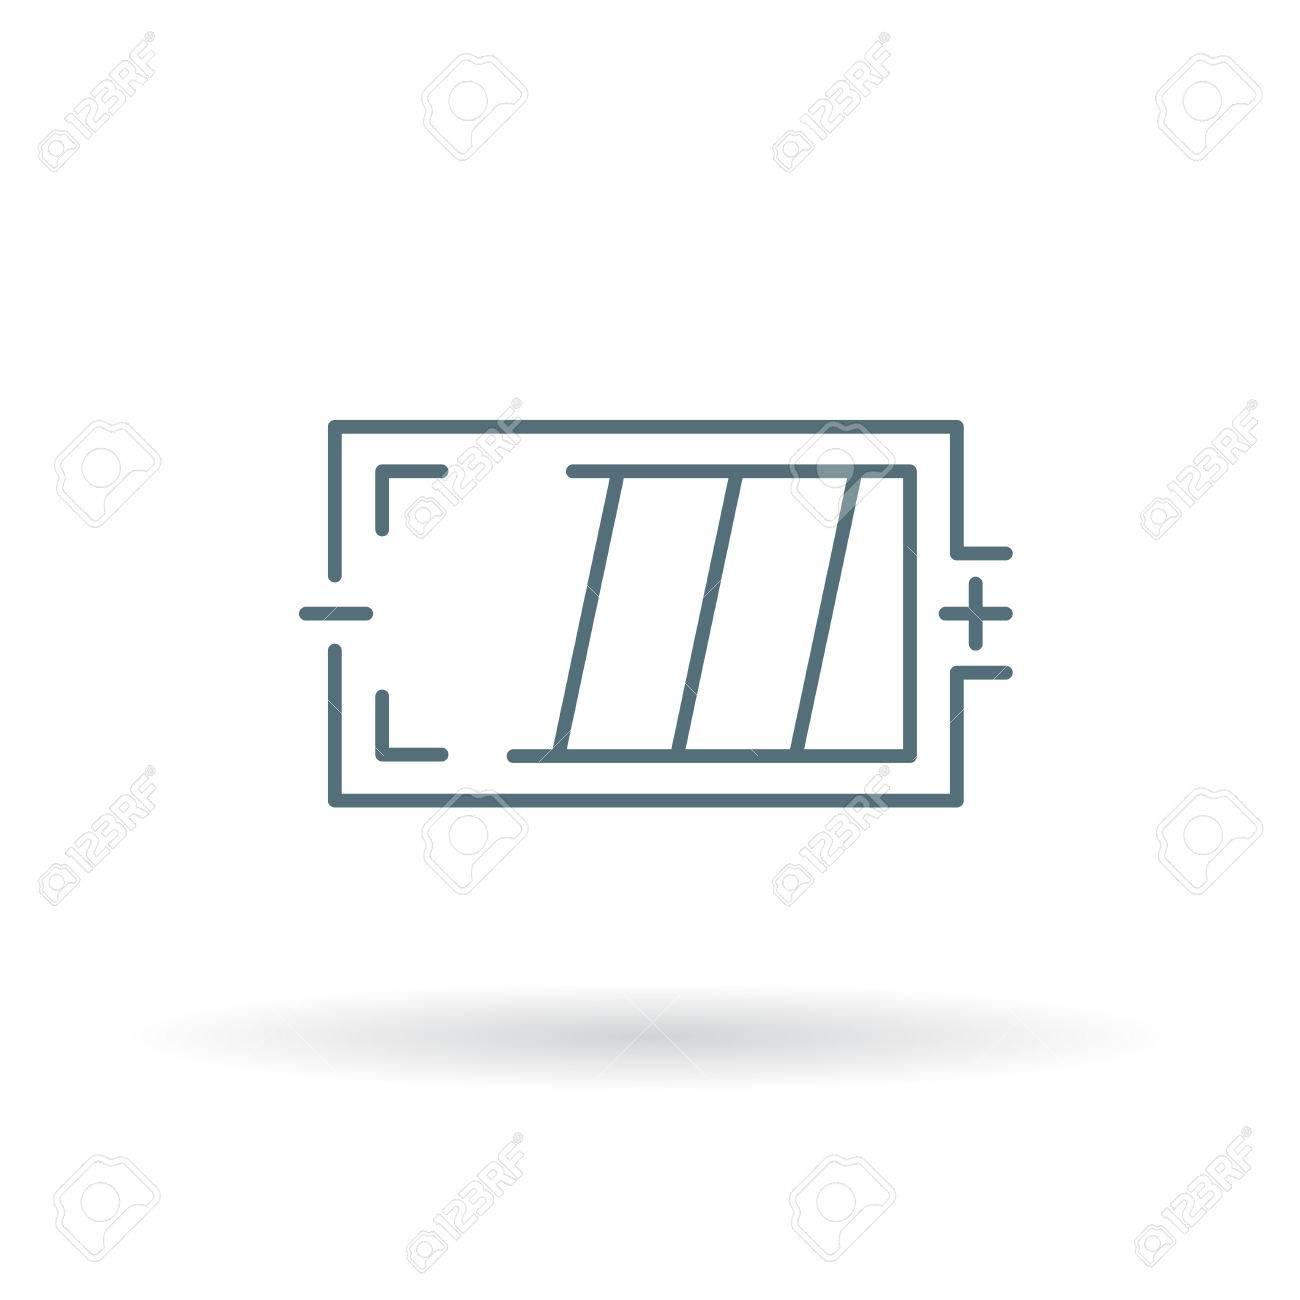 Charmant Symbol Der Batterie Ideen - Elektrische Schaltplan-Ideen ...